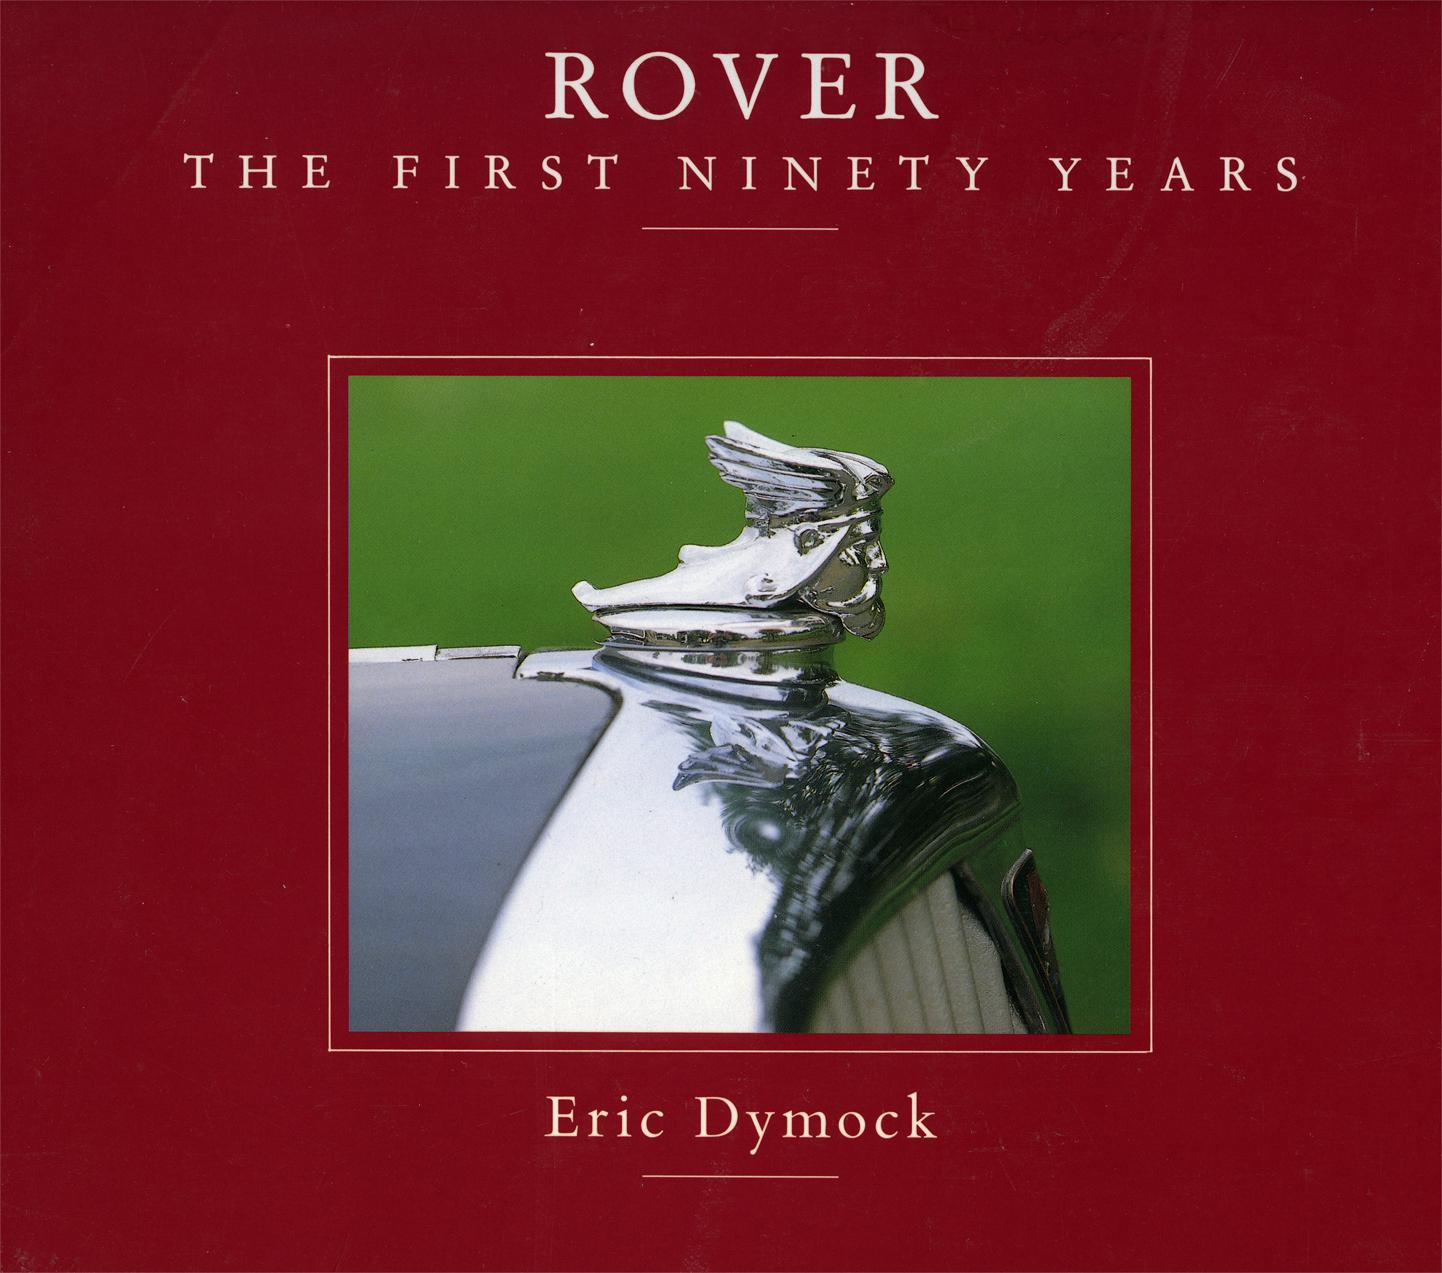 Our Rover Book